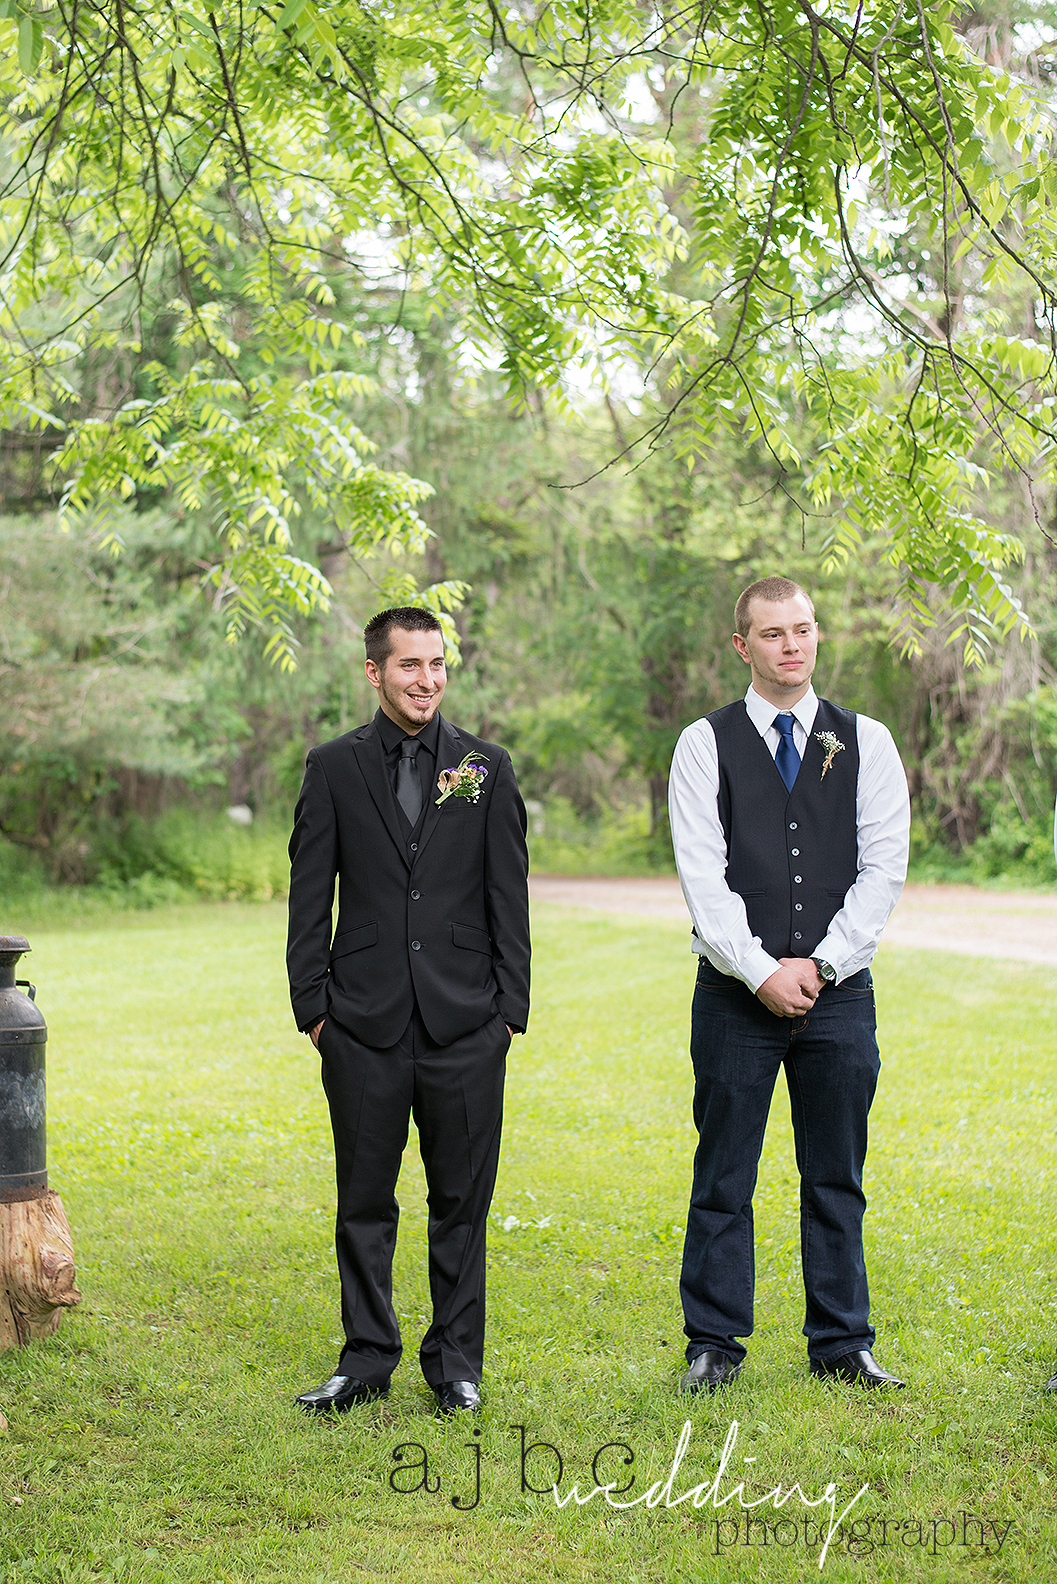 ajbcphotography-port-huron-michigan-wedding-photographer-outdoors-summer-wedding-country-wedding-wadhams-michigan-bride-groom-love-vintage-wedding-groomsmen.jpg